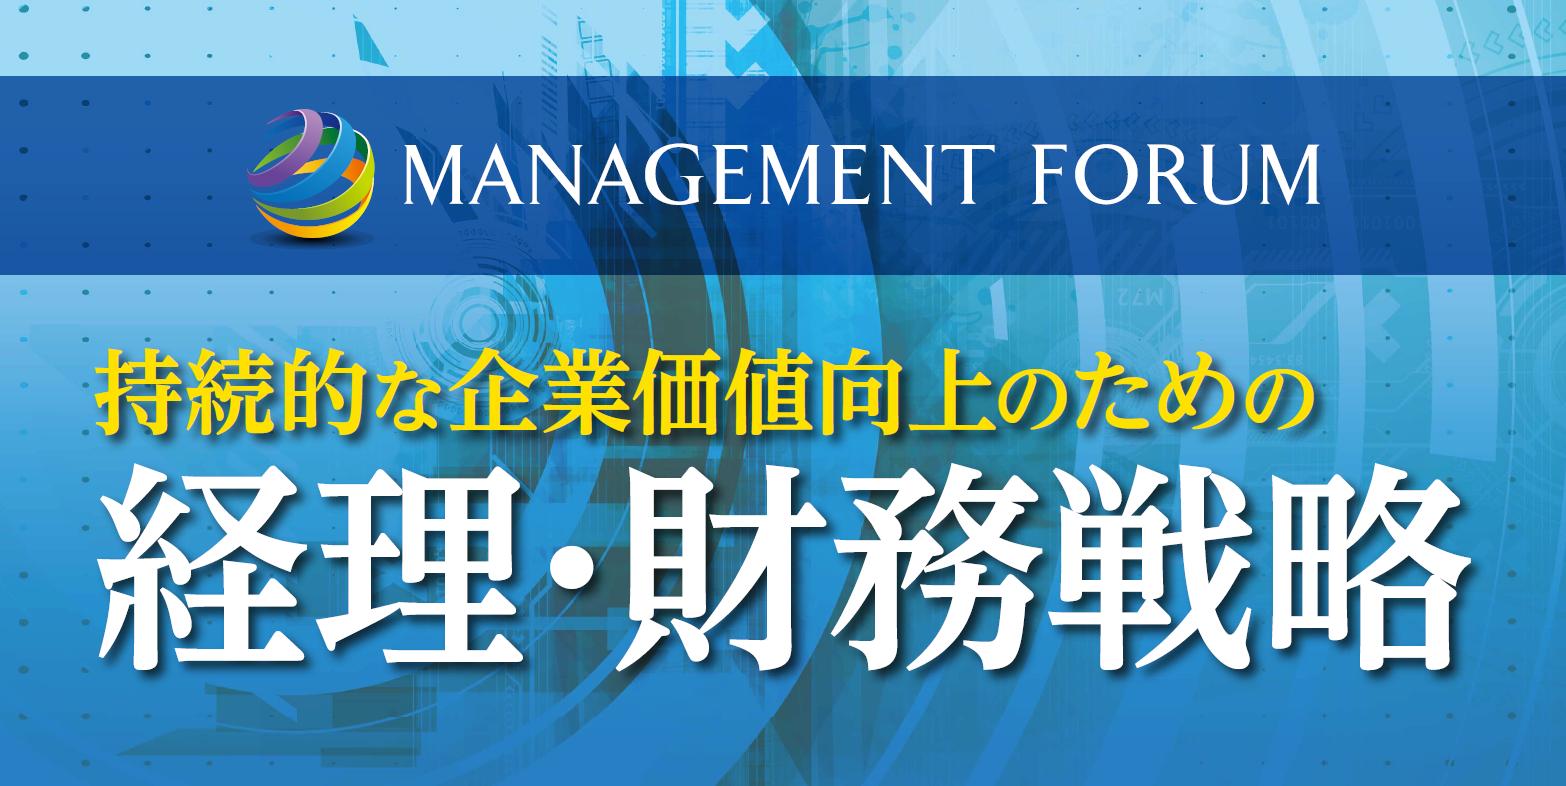 MANAGEMENT FORUM 持続的な企業価値向上のための経理・財務戦略<アフターレポート>